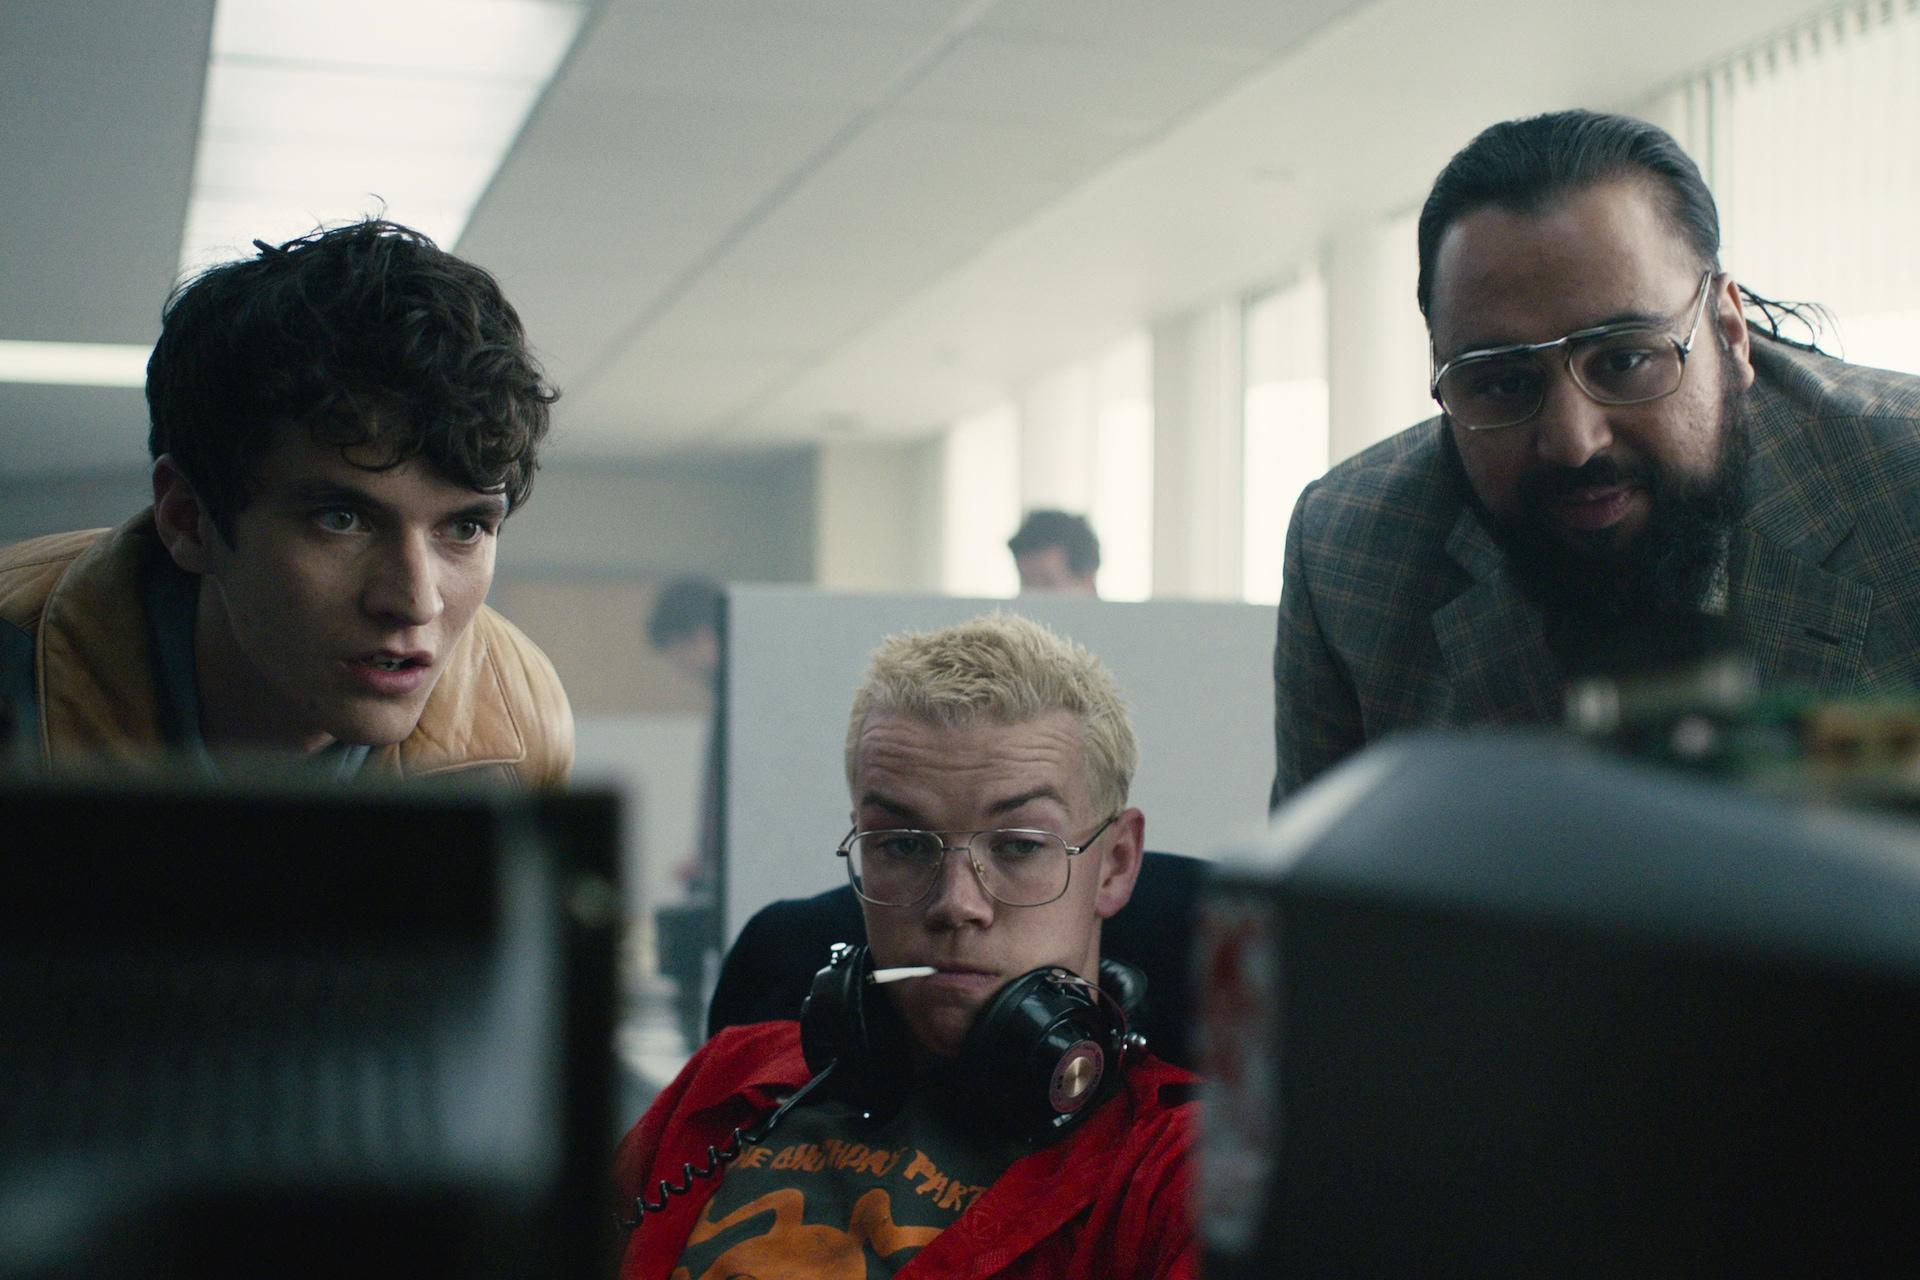 V Black Mirror: Bandersnatch hrají Fionn Whitehead, Will Poulter a Asim Chaudhry